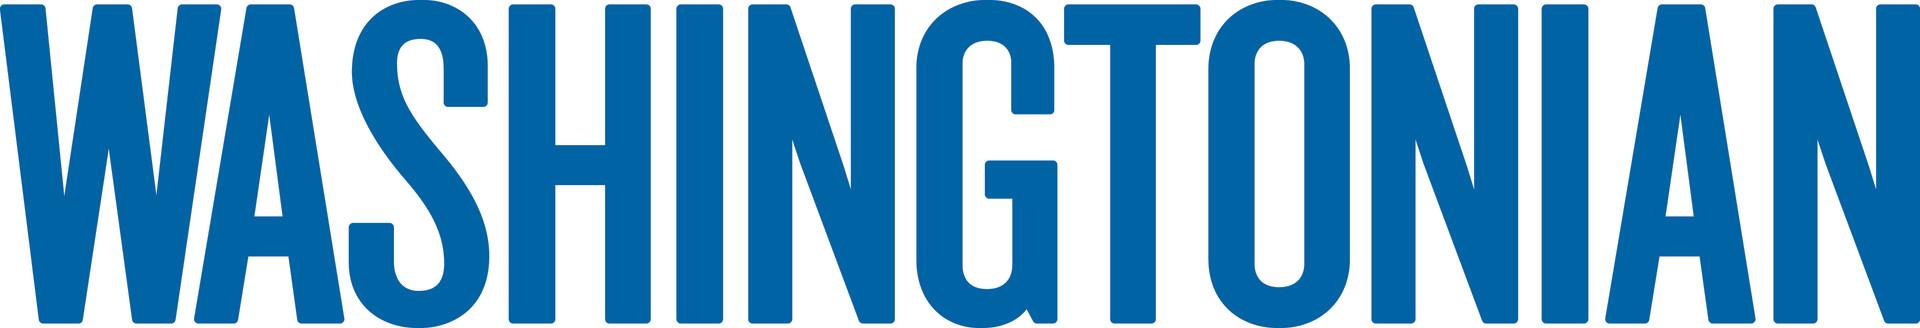 Washingtonian Logo Blue.jpg